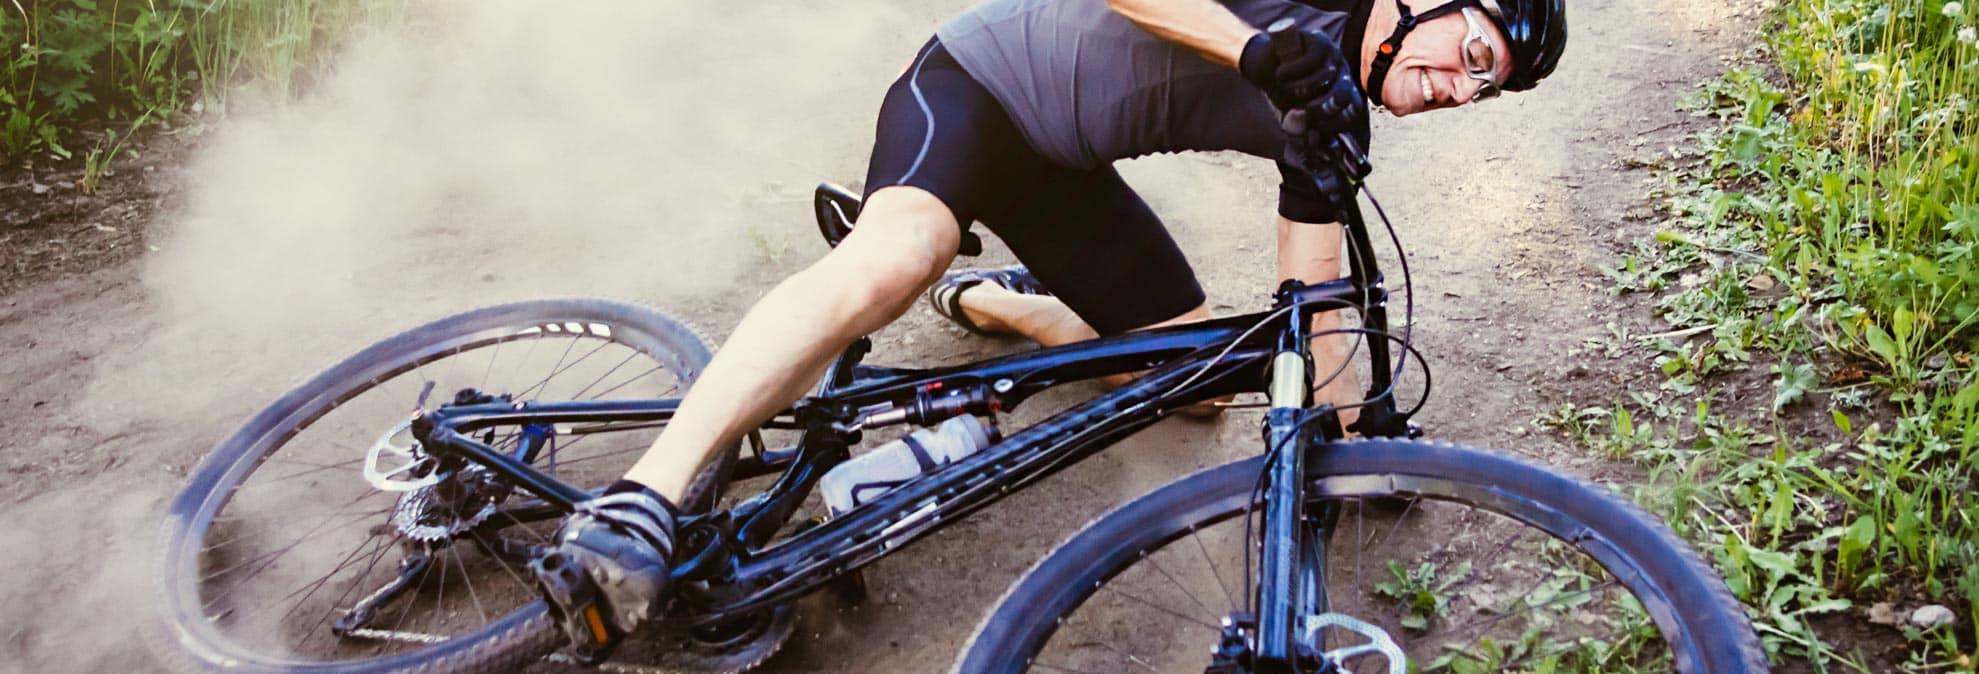 Protection From Bicycle Crash Injury Bike Helmet